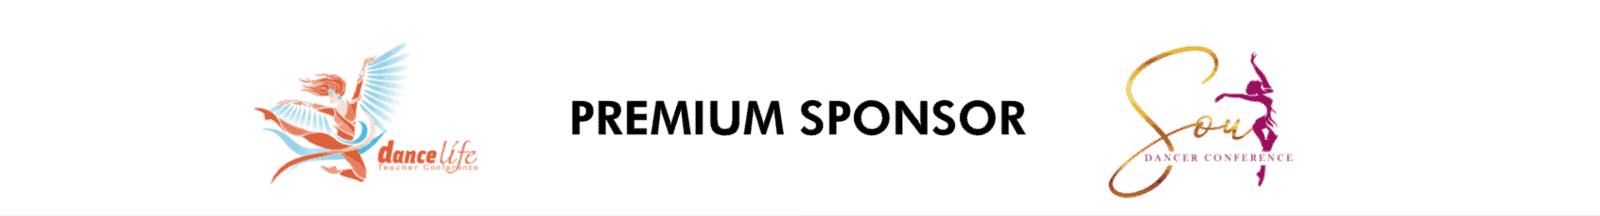 Soul Premium Sponsor 1